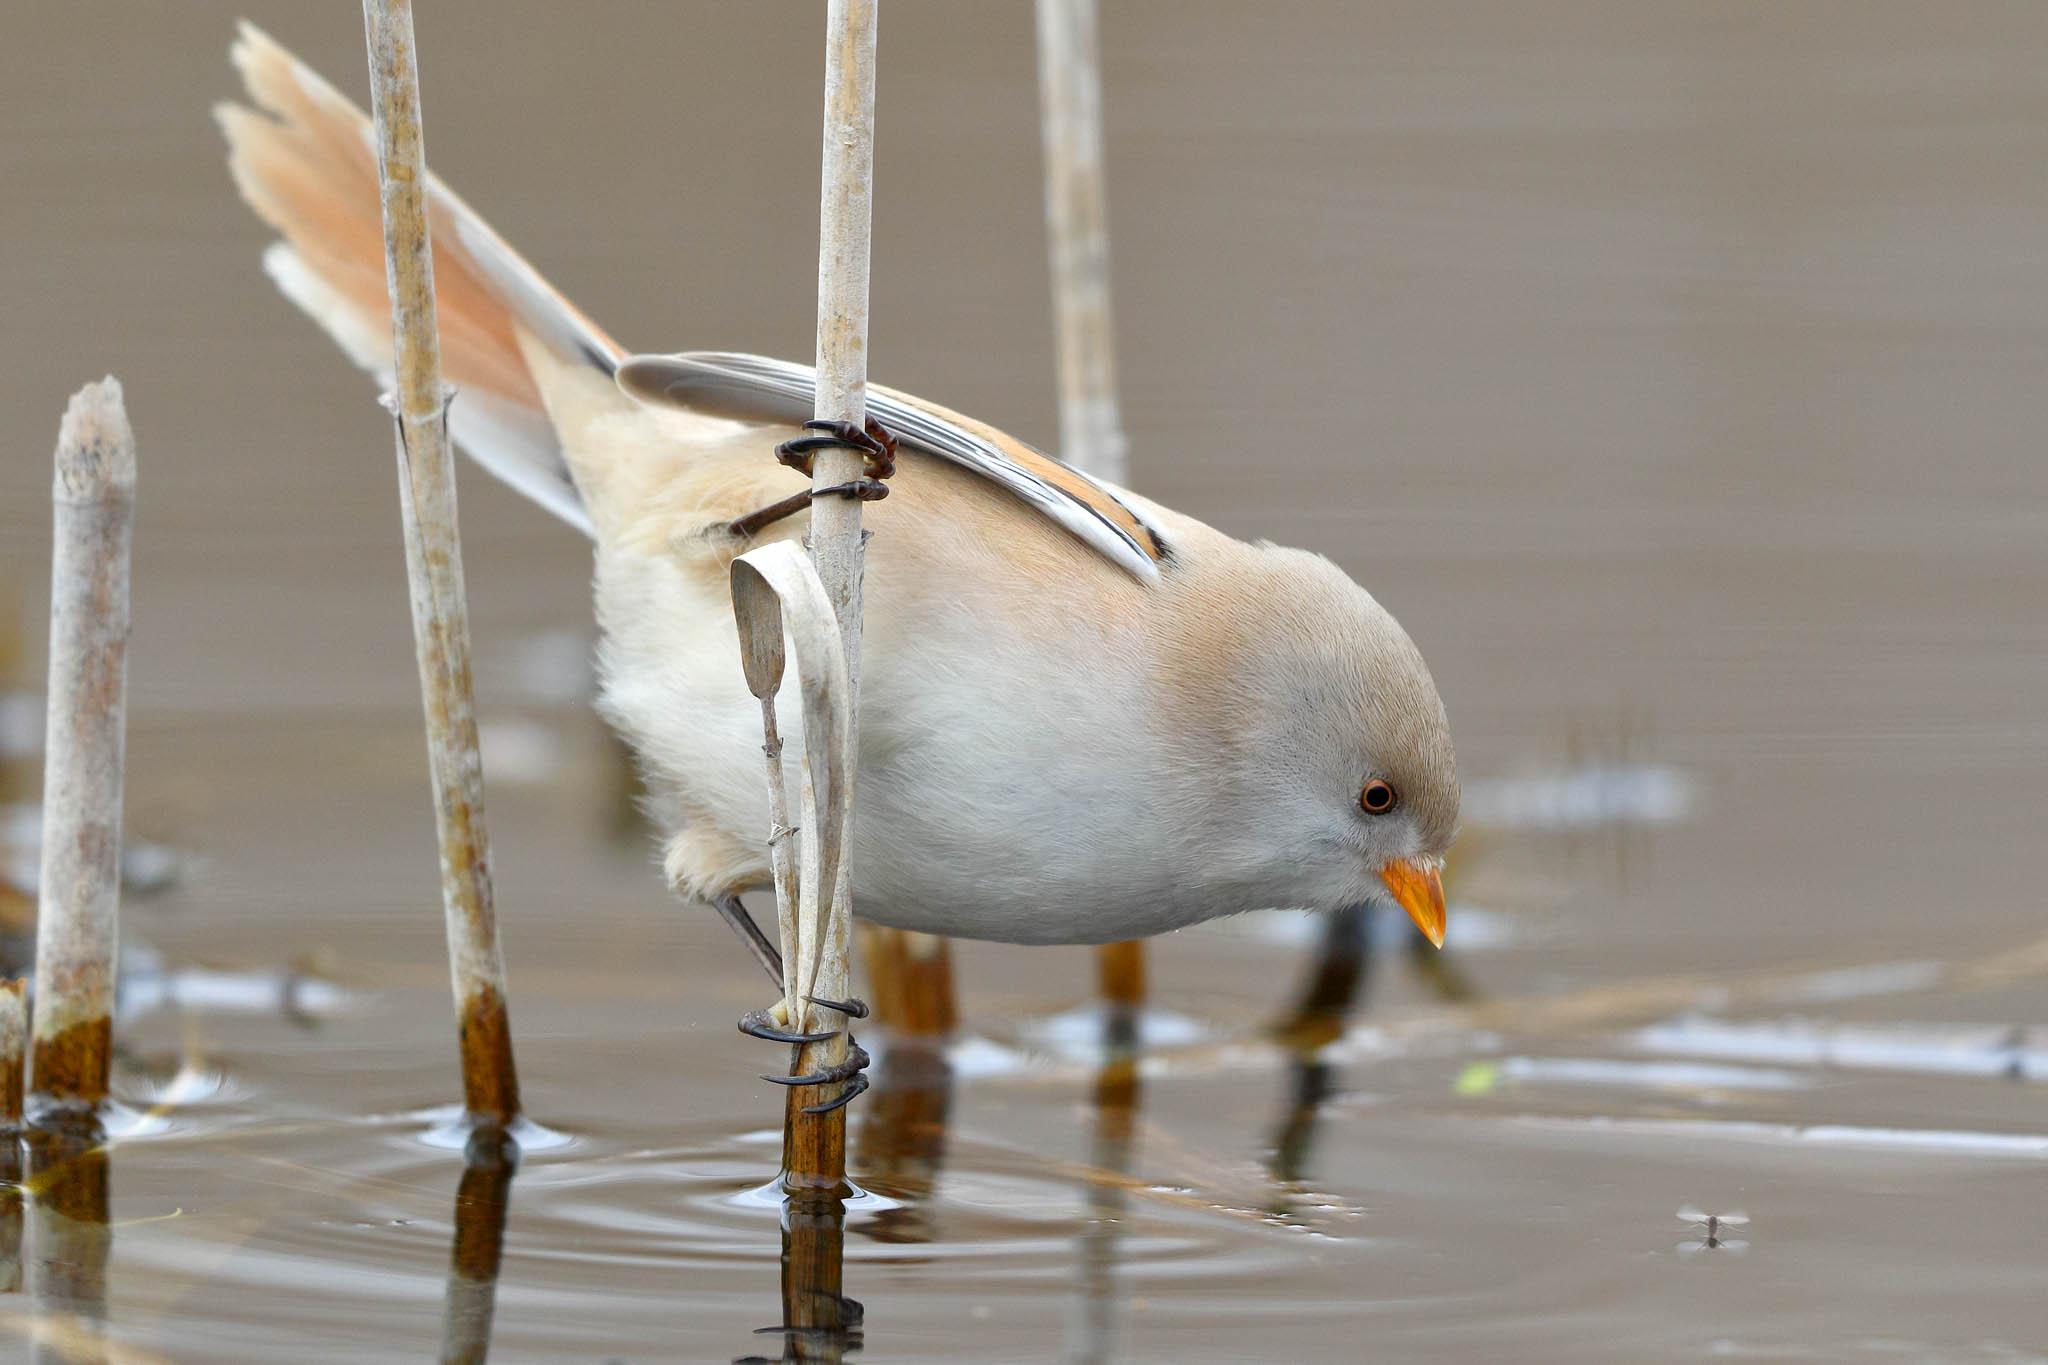 Hermosa ave redonda tomando agua